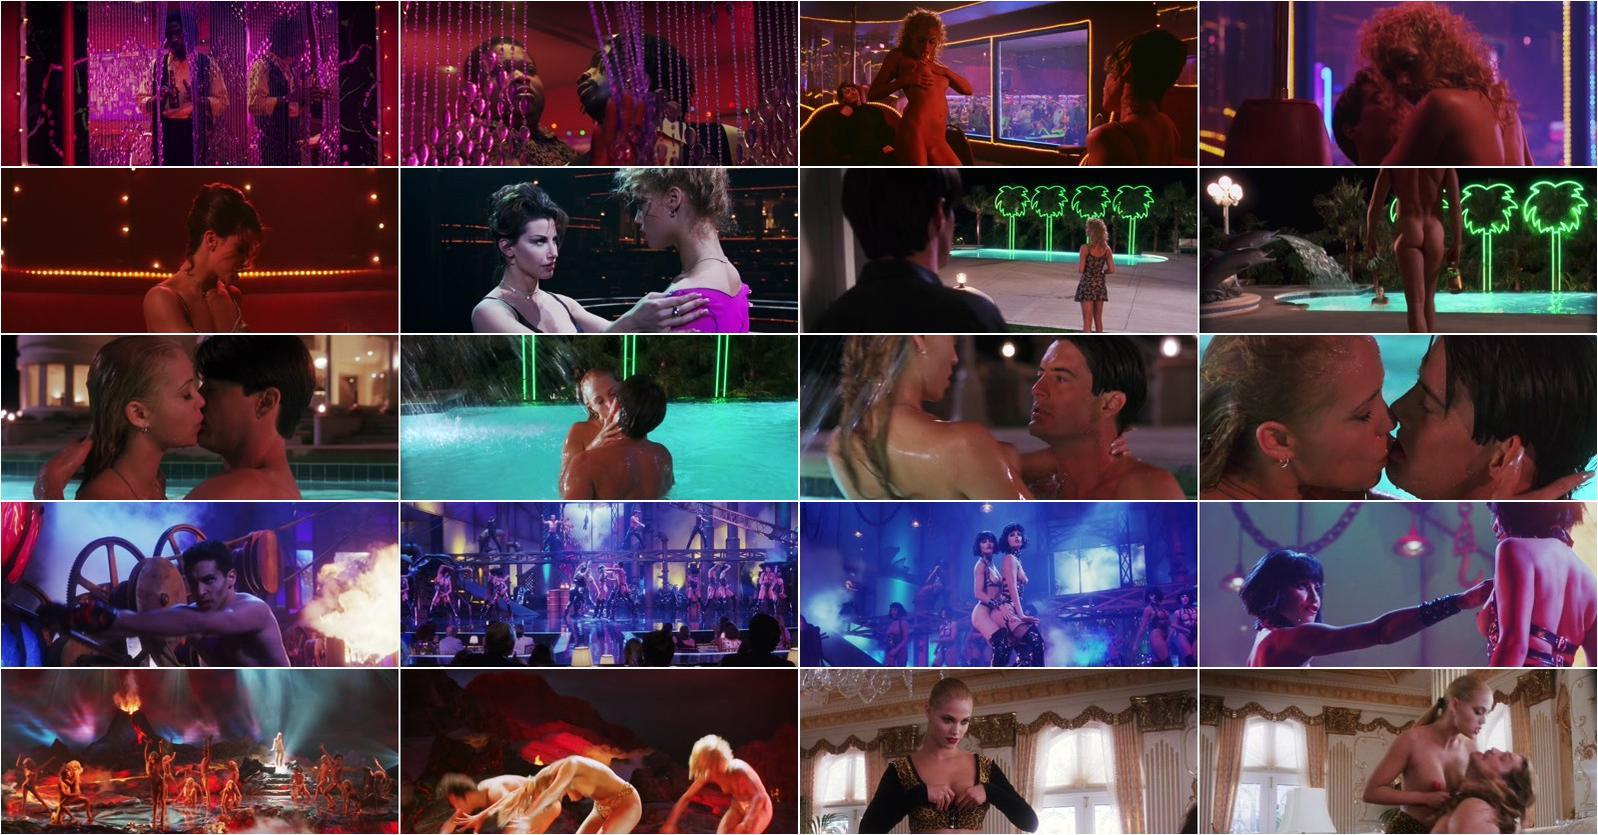 Elizabeth Berkley nude - Showgirls (1995)